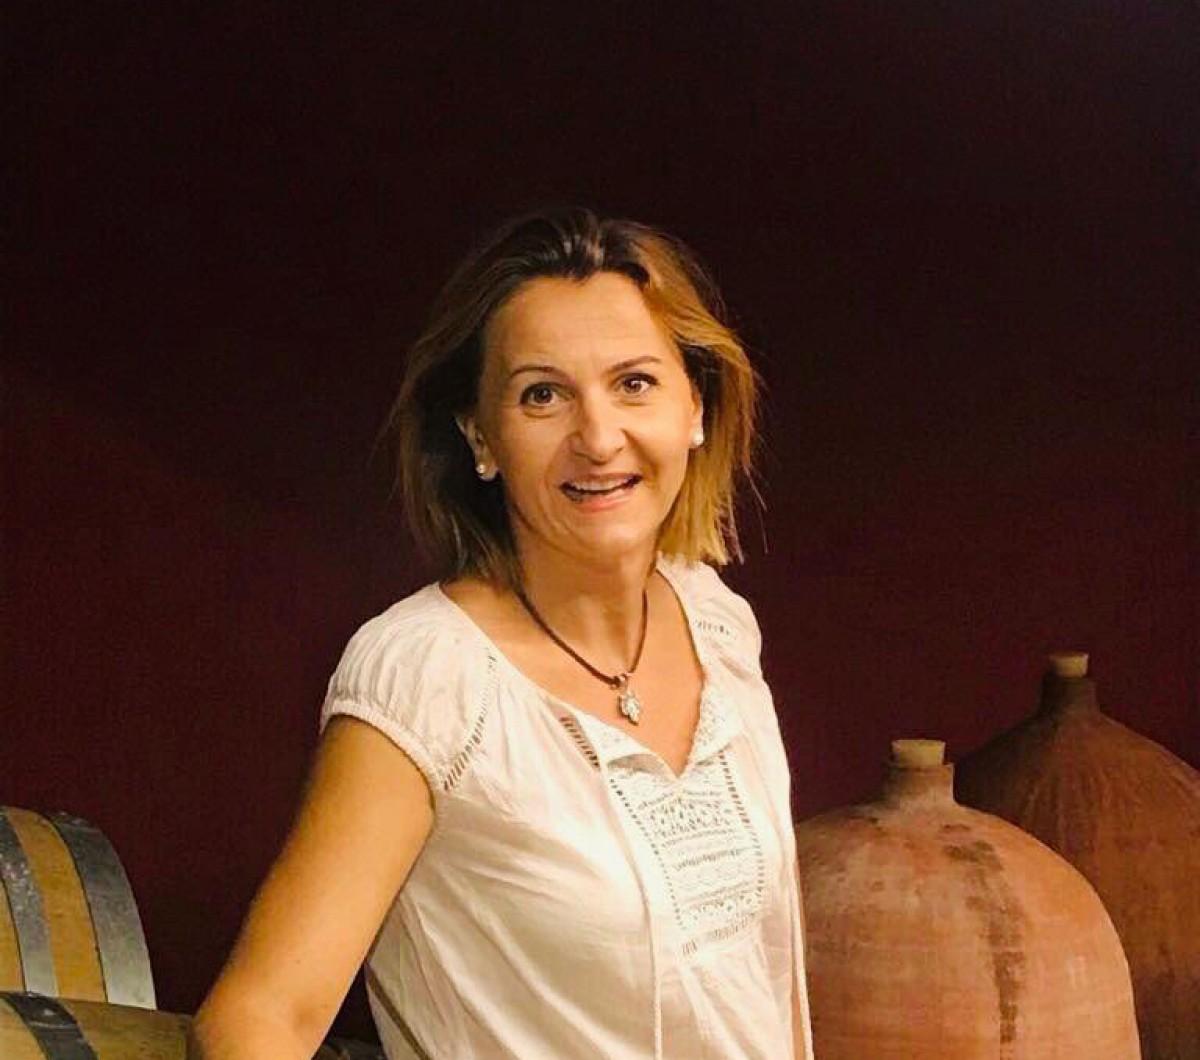 Mariona Rendé, propietària del celler desaparegut Rendé Masdéu